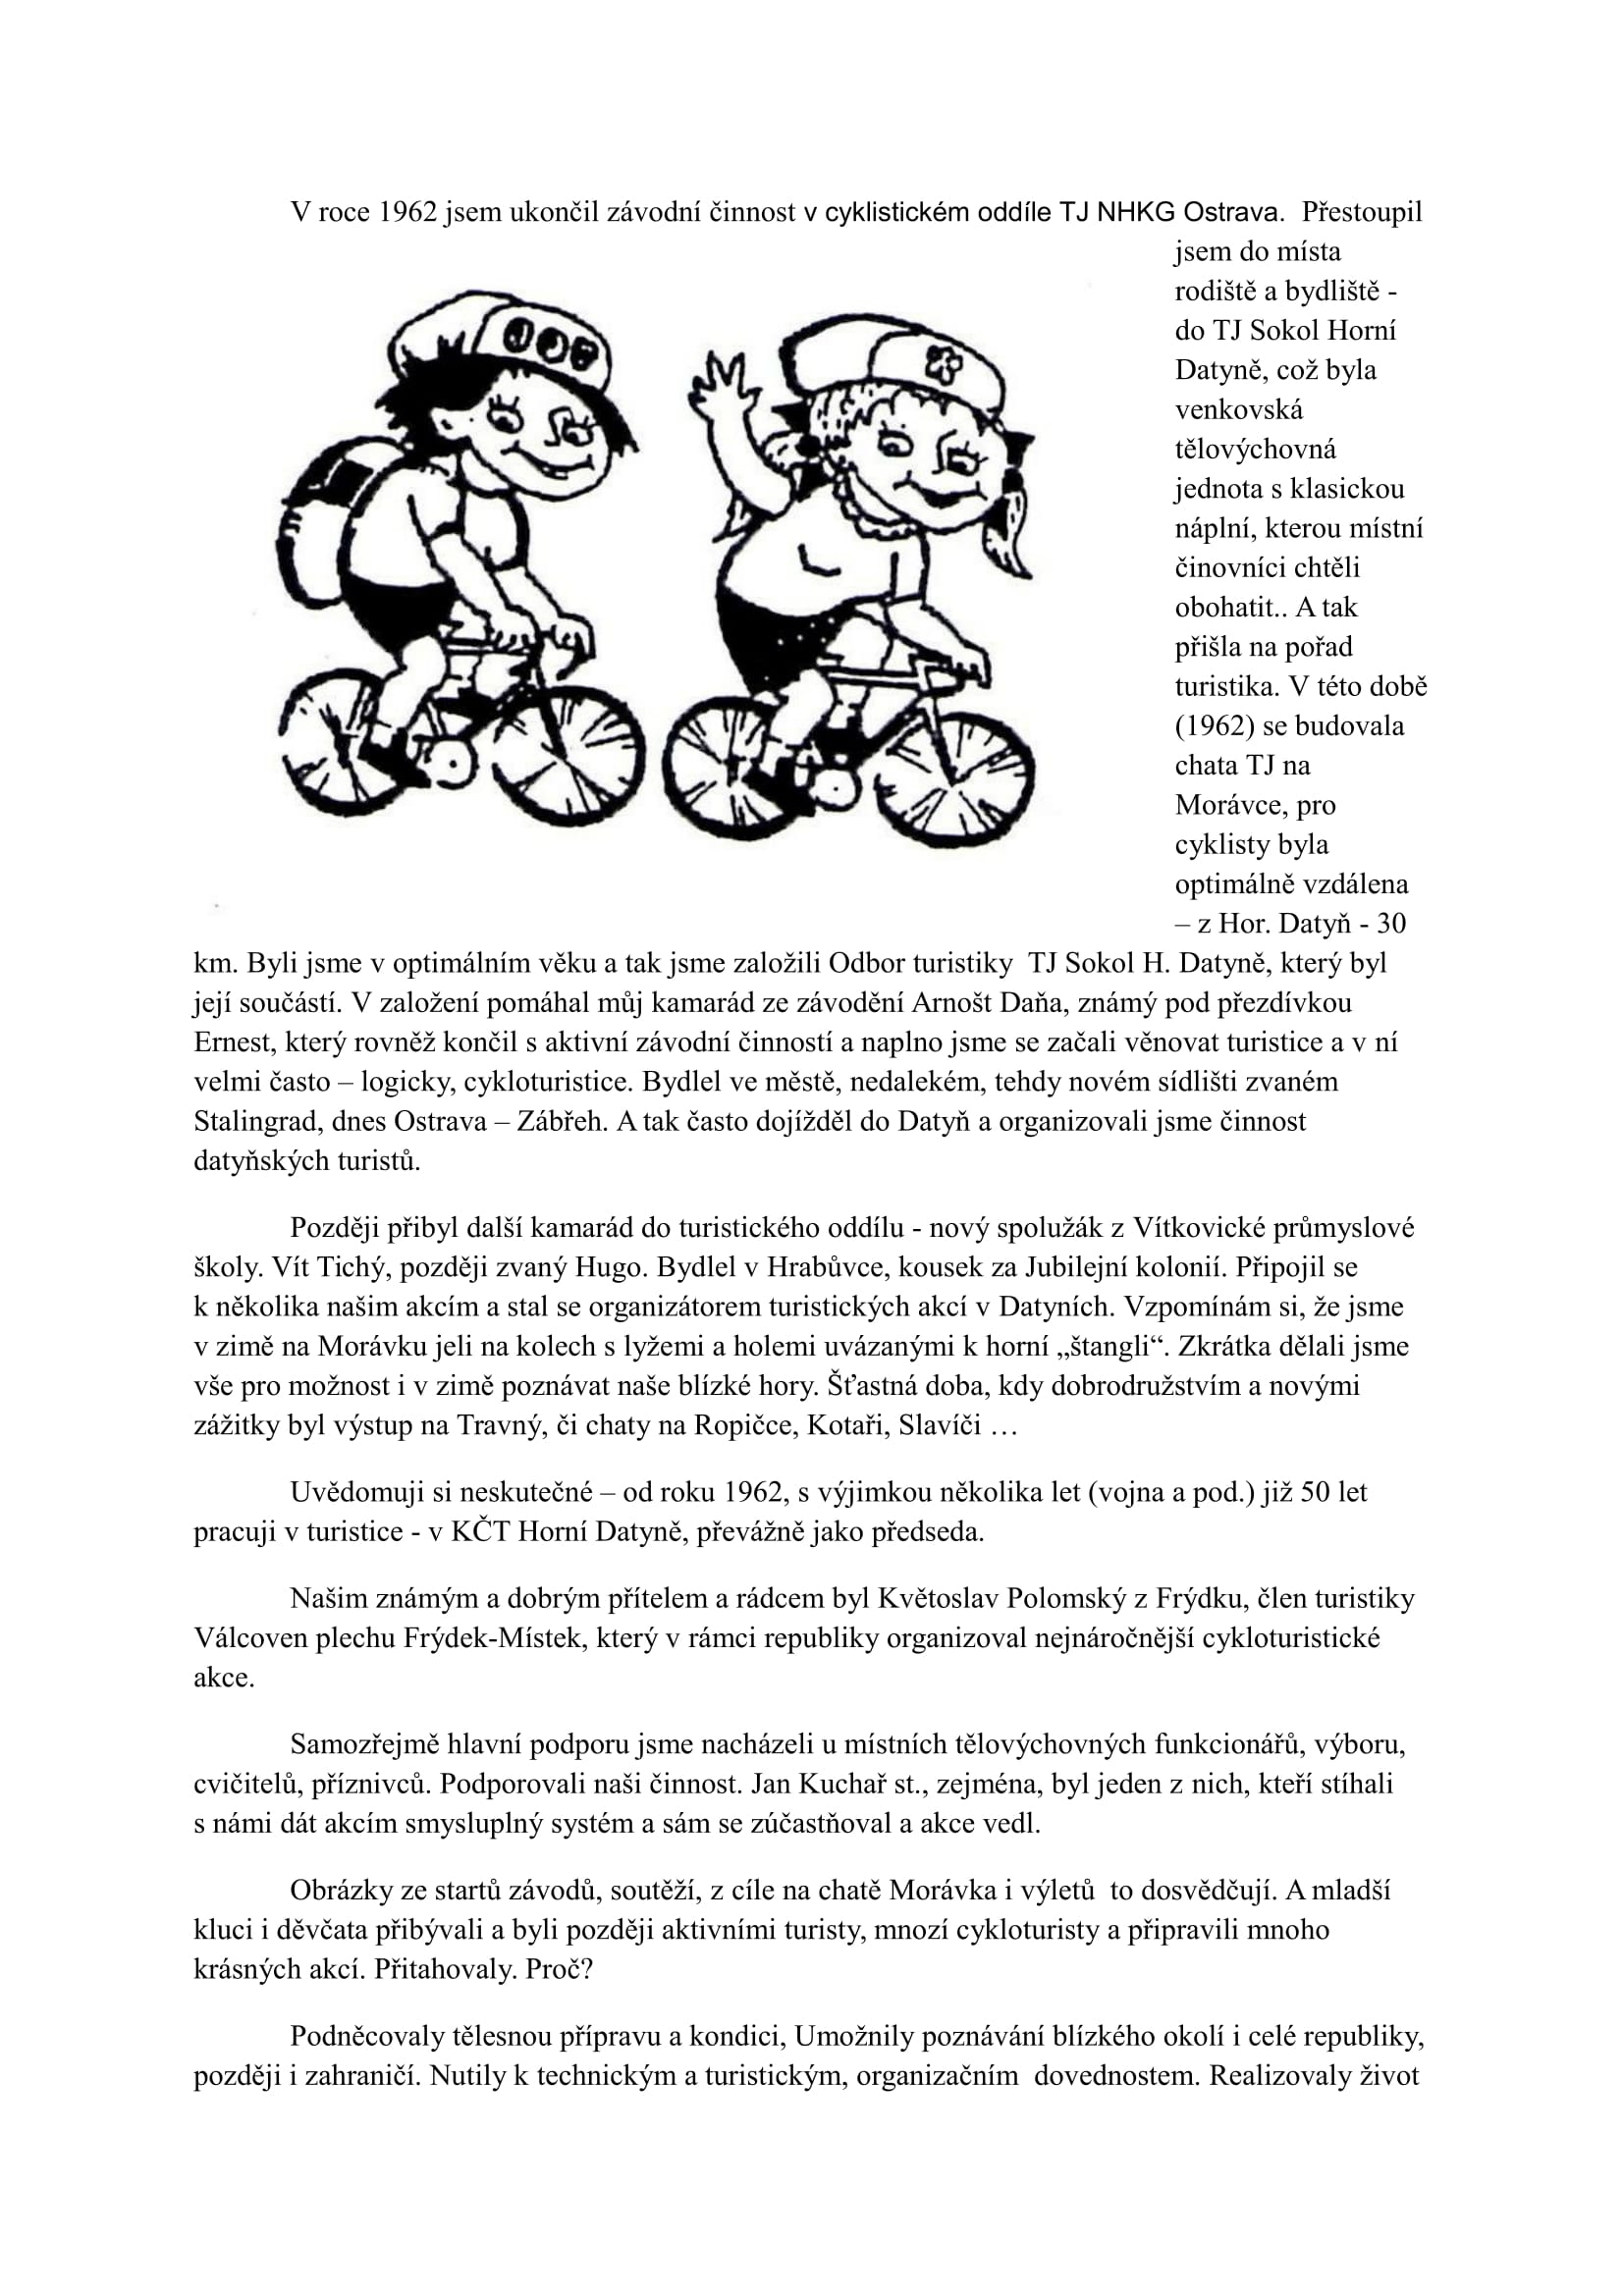 Sborník 50 let chata-11